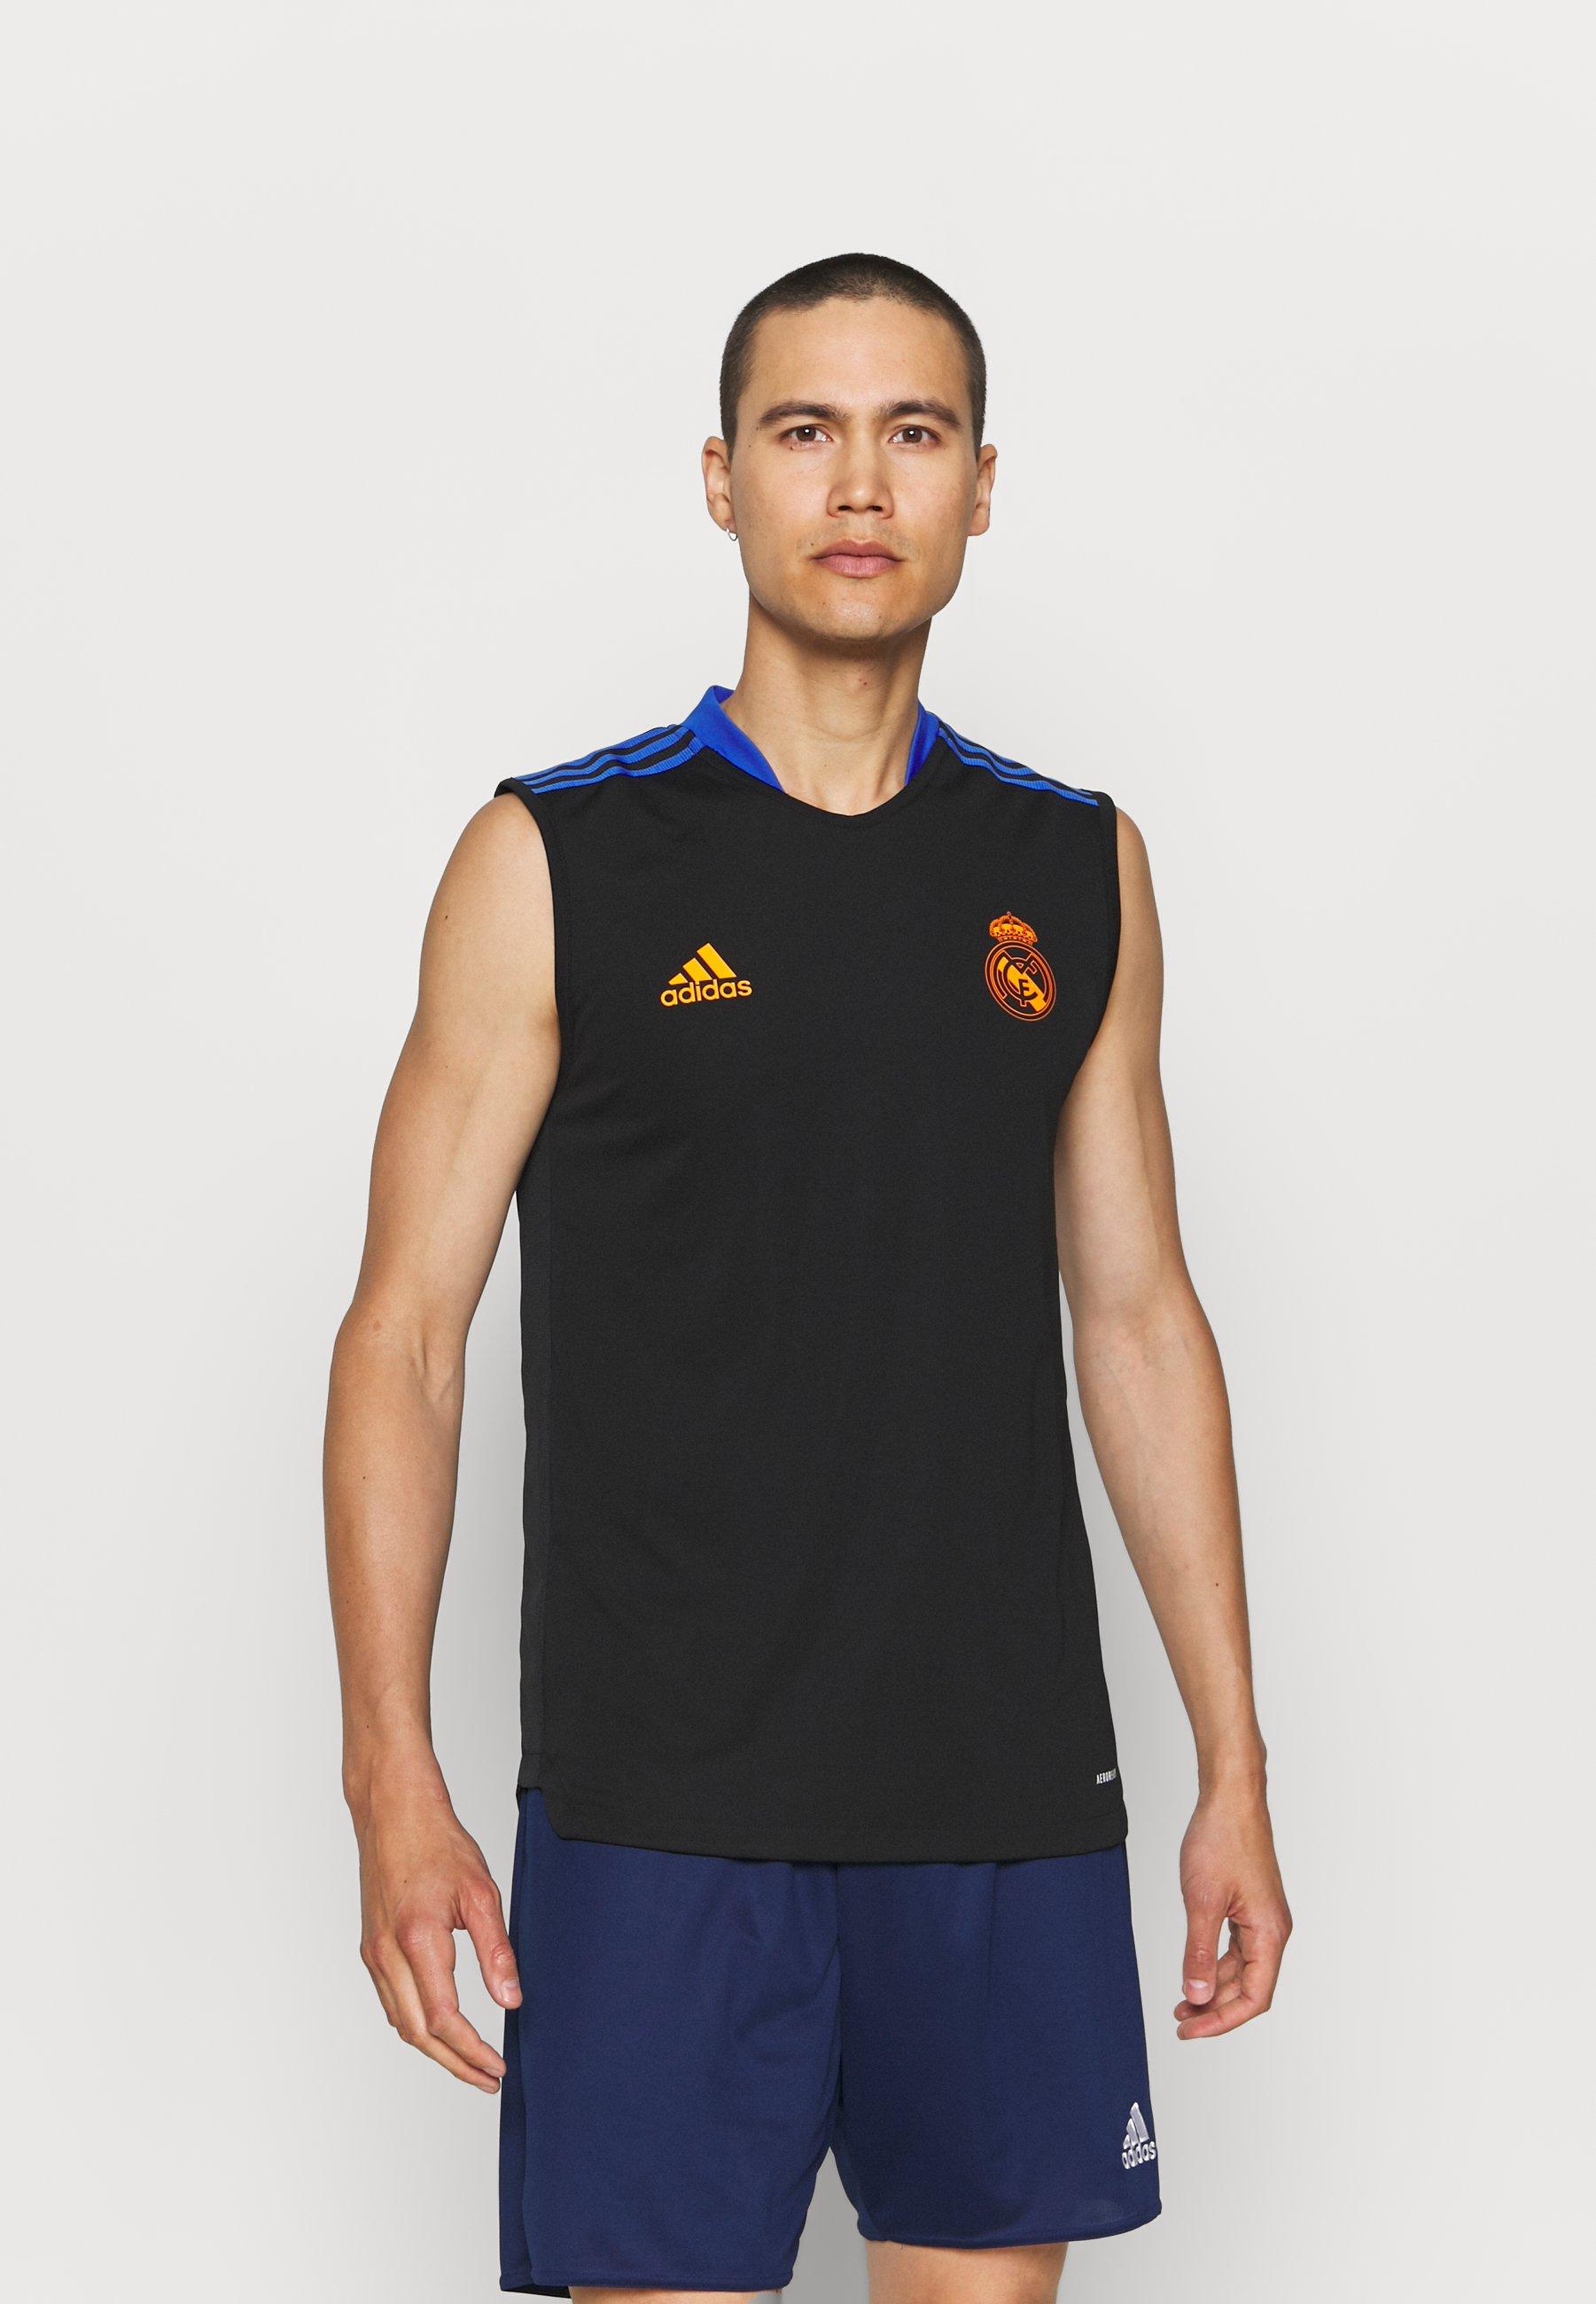 Uomo REAL MADRID SL JSY - Squadra